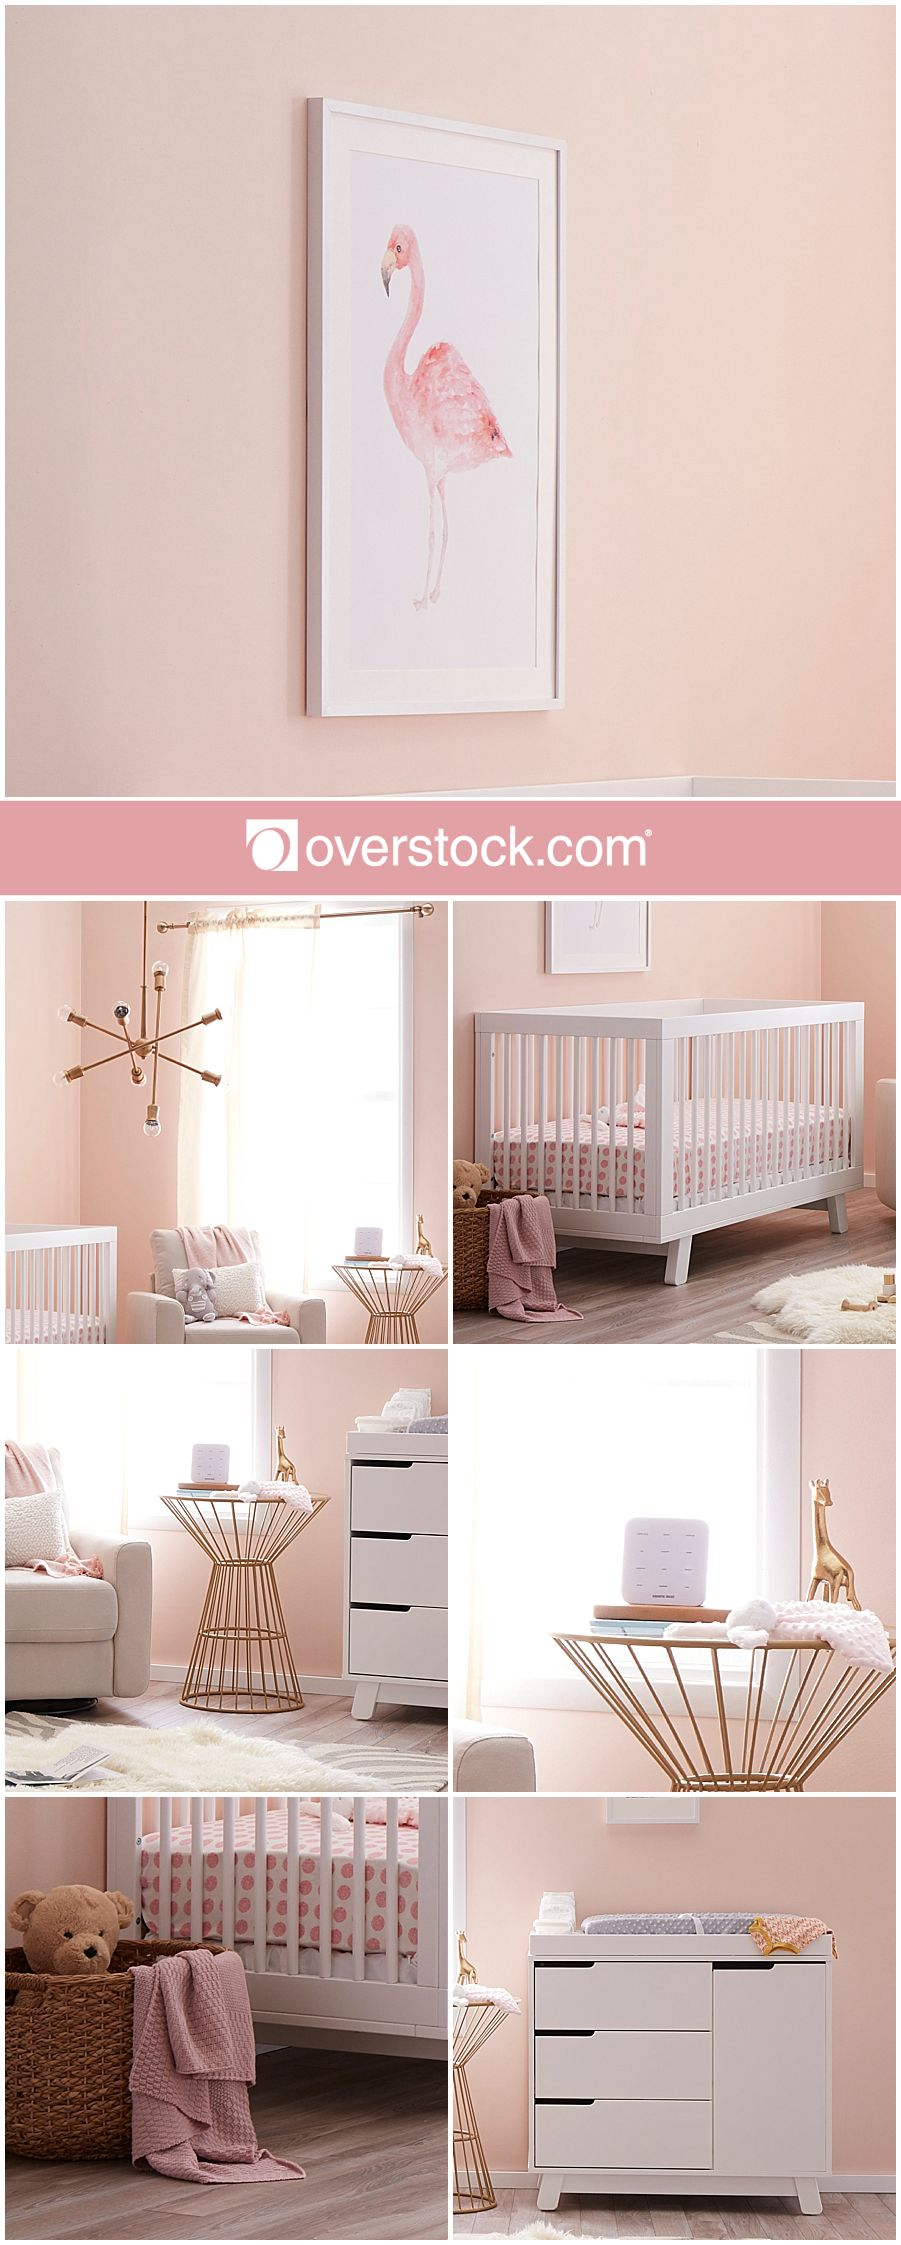 Adorable Baby Nursery Ideas For Boys And Girls